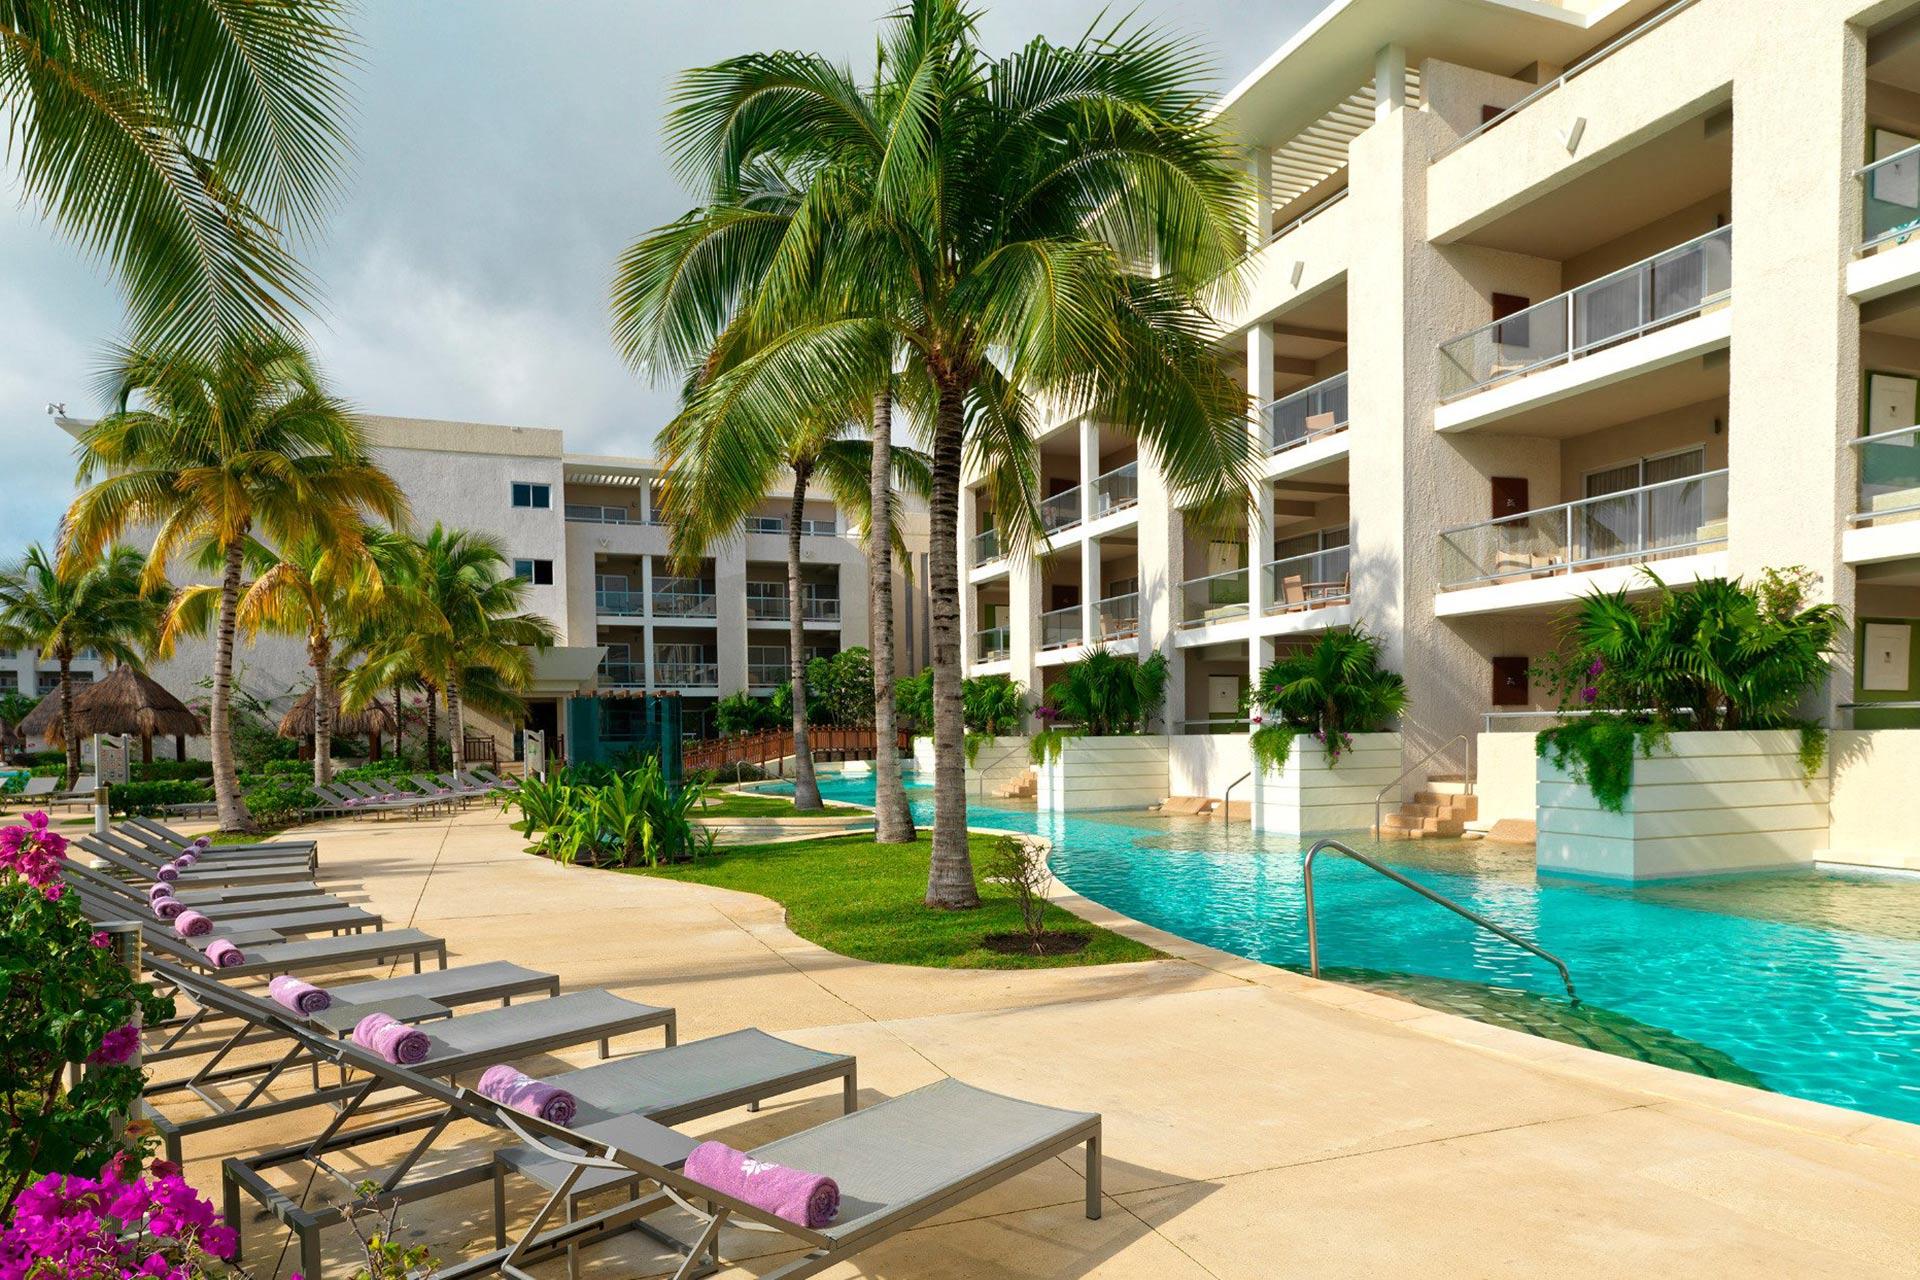 Swim-up suites at Paradisus Playa del Carmen La Esmeralda.